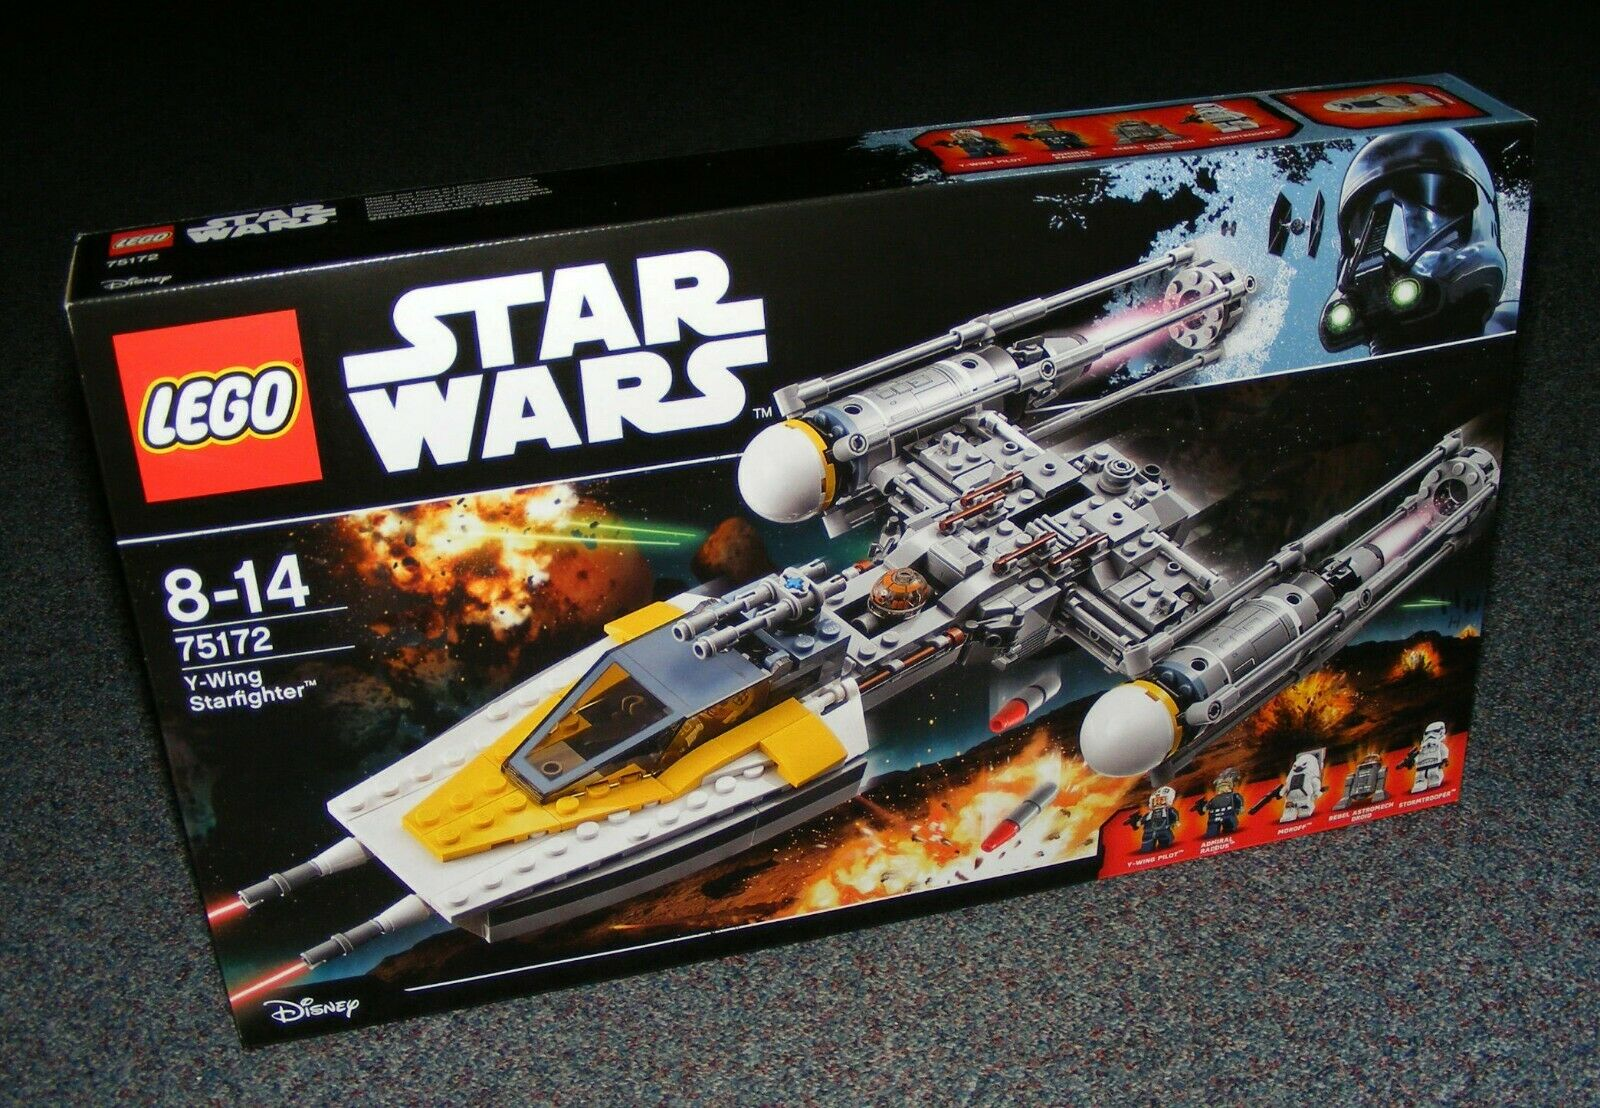 STAR WARS LEGO 75172 Y-WING STARFIGHTER BRAND NEW SEALED BNIB